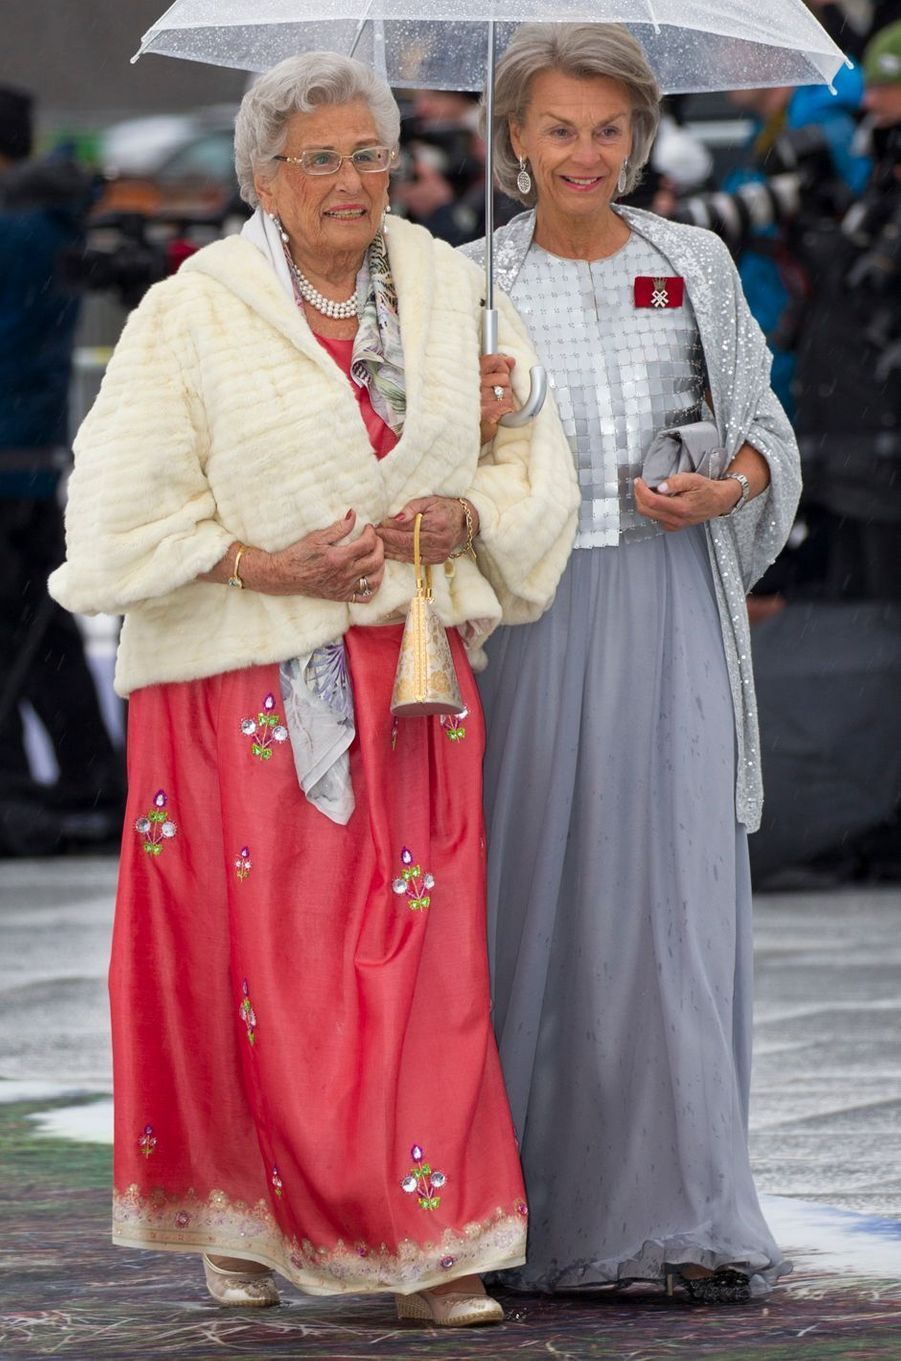 La princesse Astrid de Norvège (à gauche) à Oslo, le 10 mai 2017